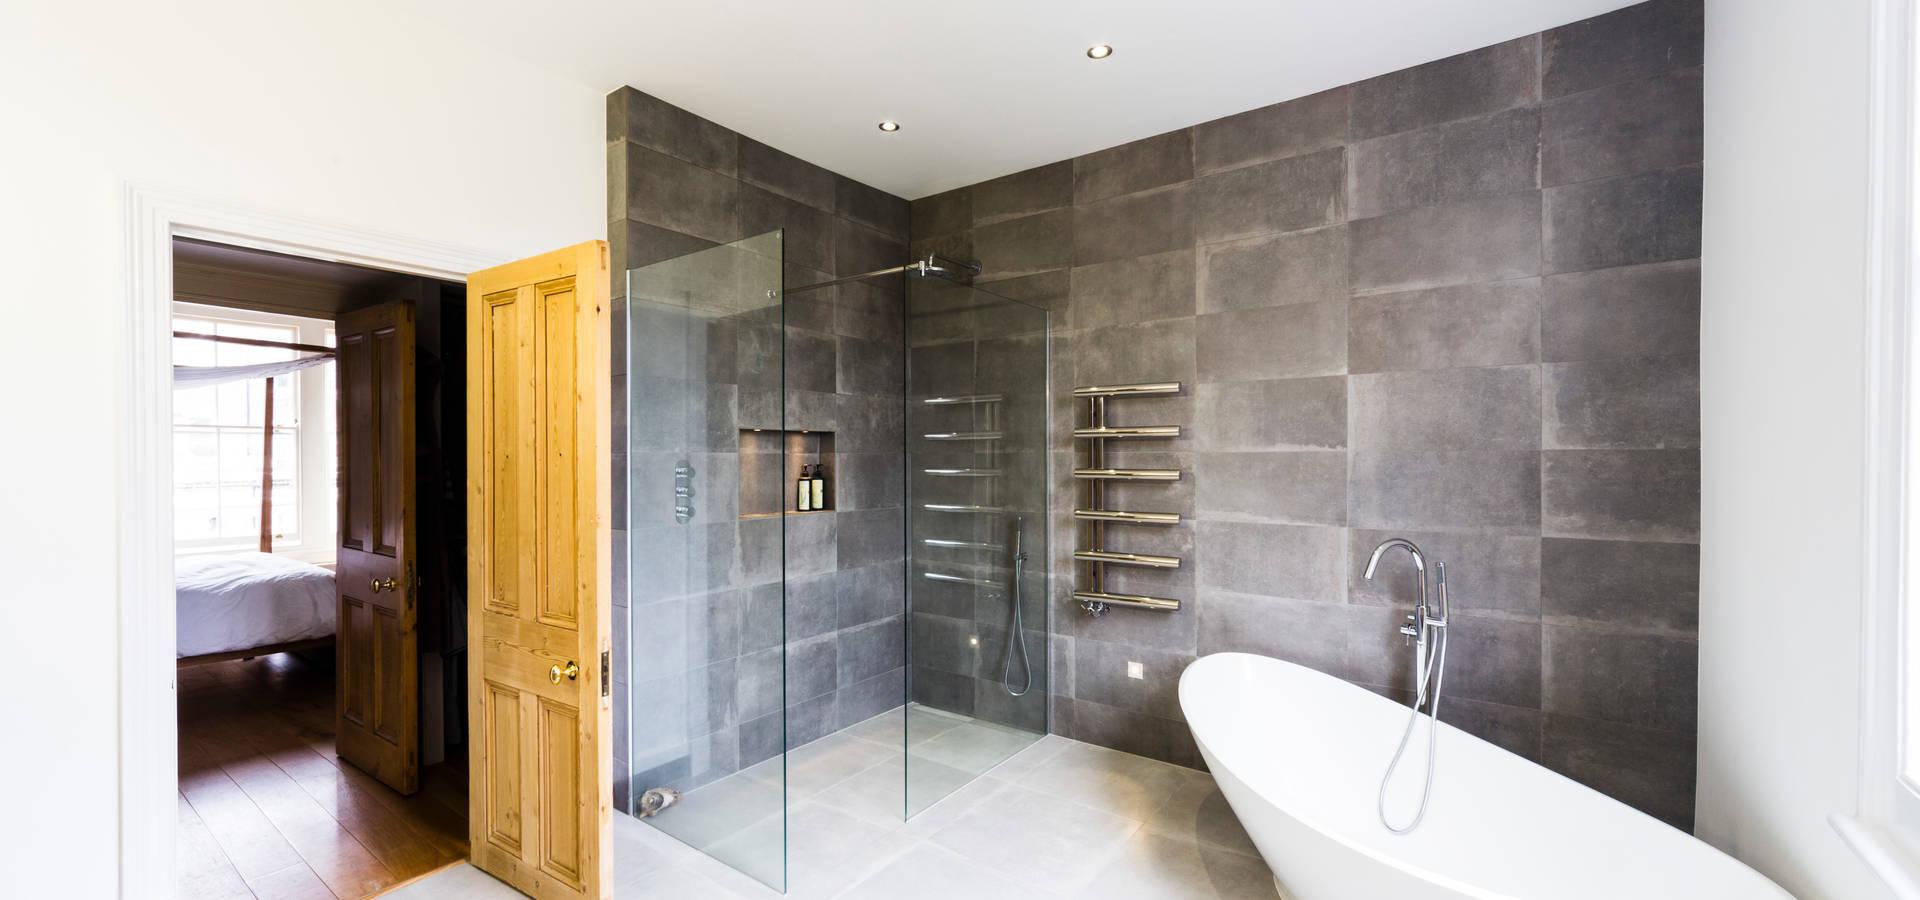 Remarkable Hausanbau Modern Decoration Of Affleck Property Services